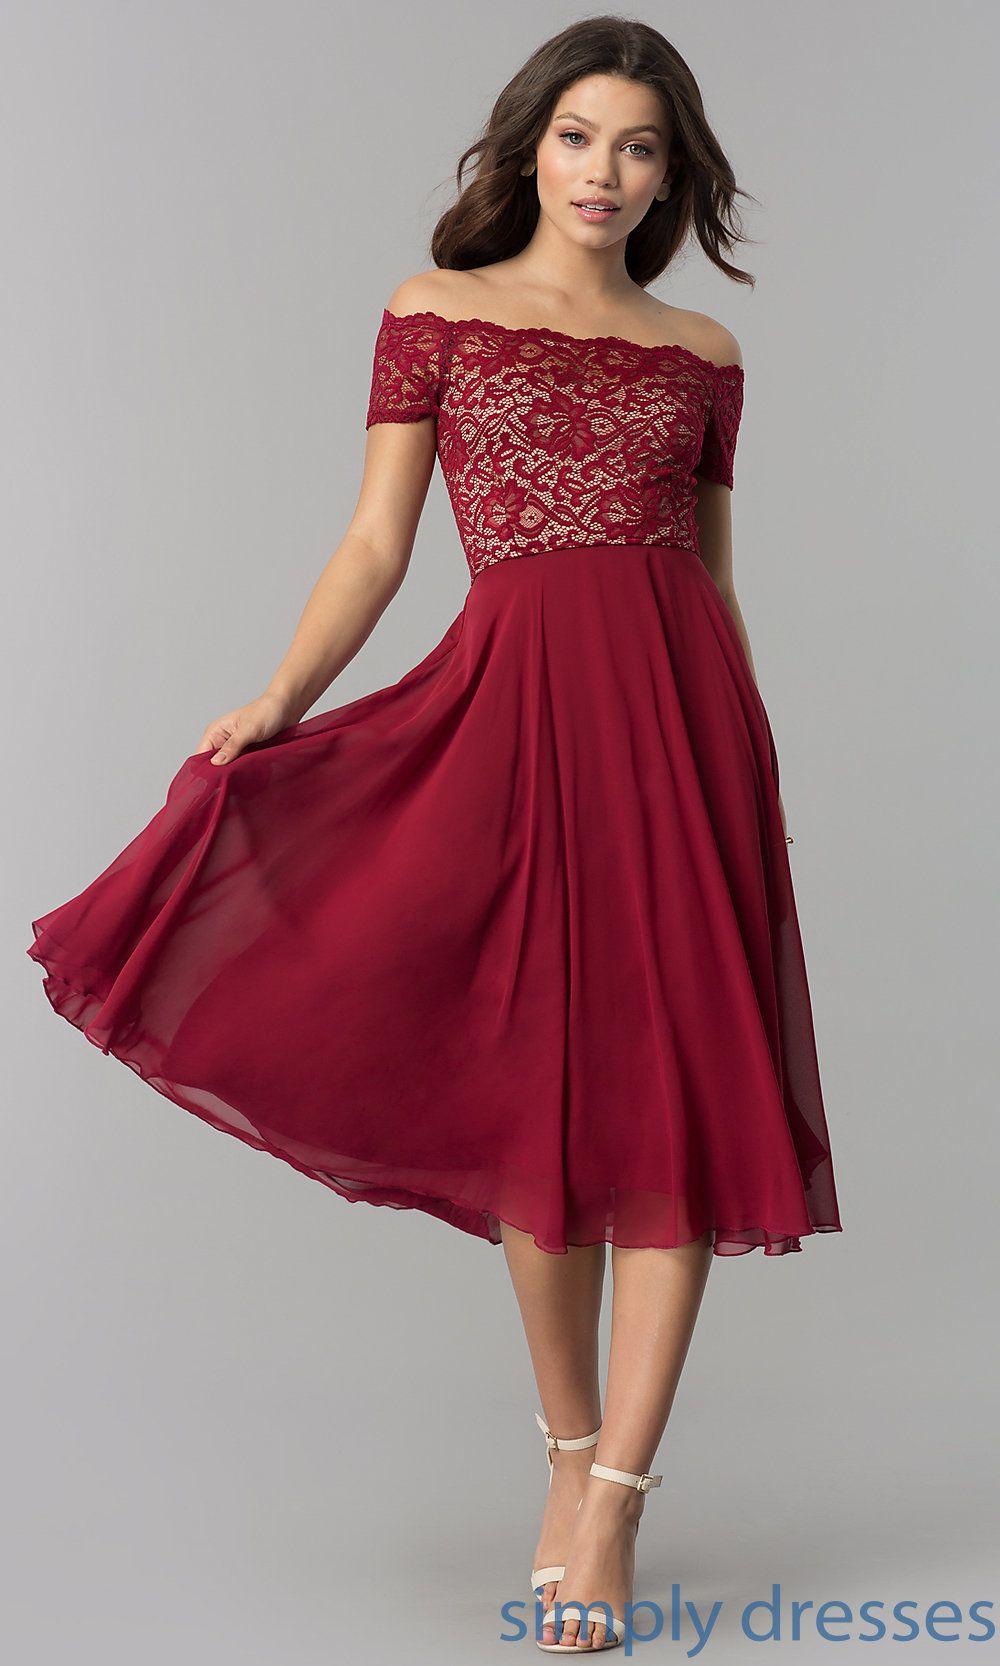 OfftheShoulder TeaLength WeddingGuest Dress in 2020